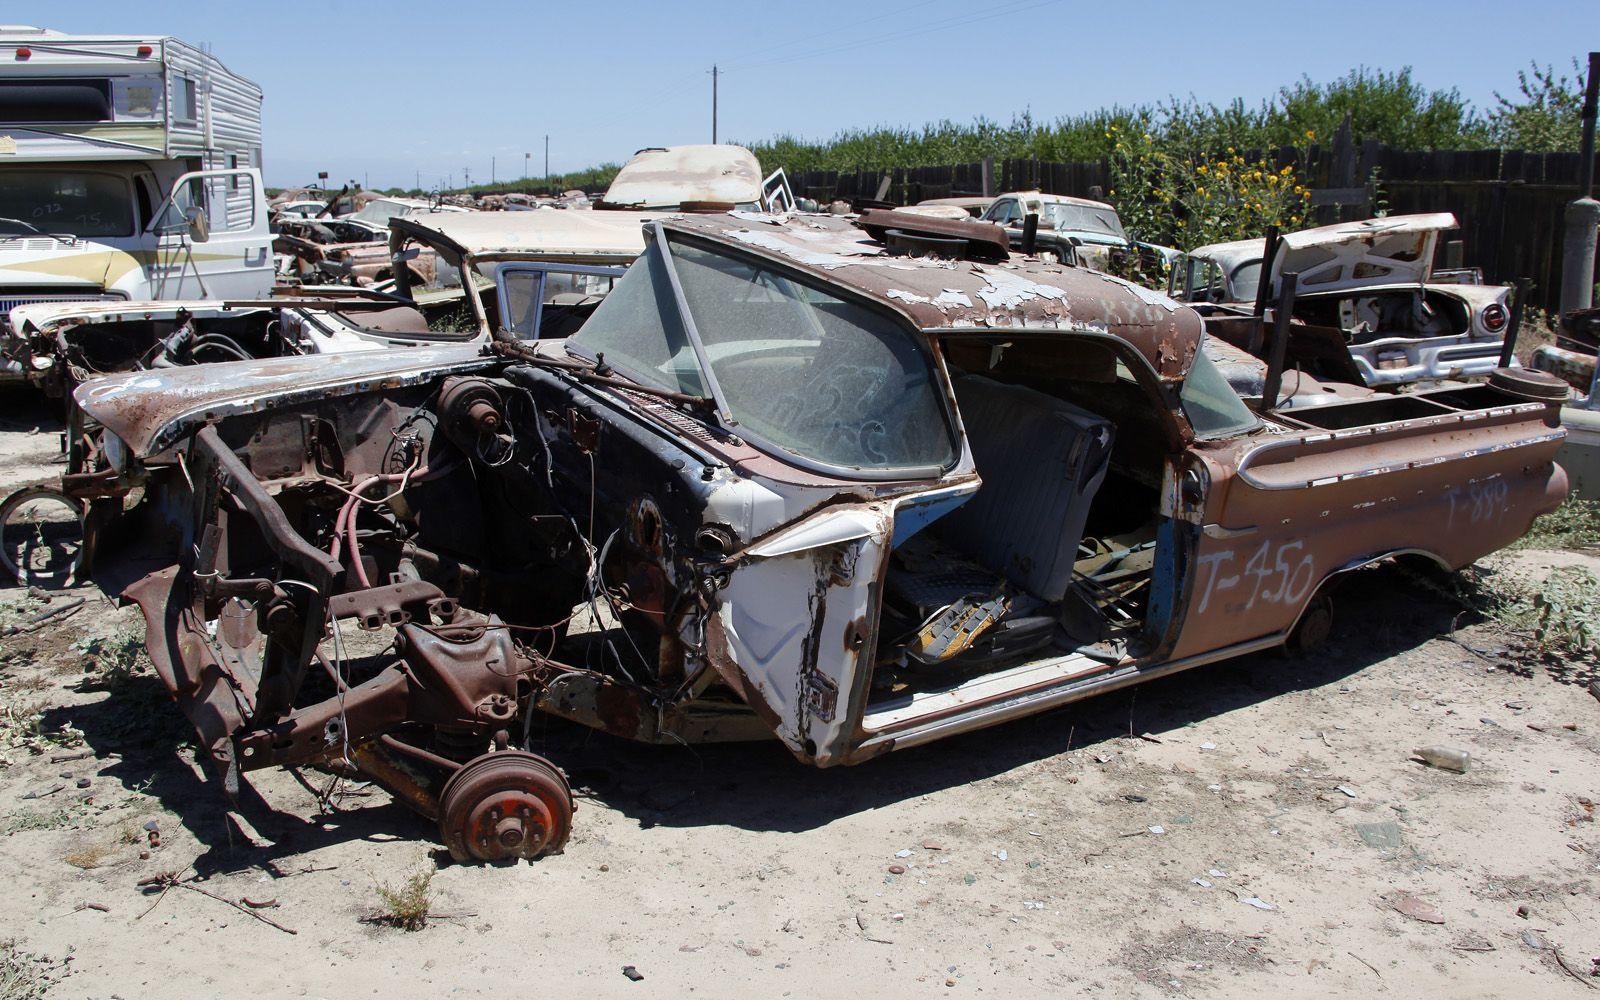 junkyard-vintage-cars-turners-auto-wrecking-fresno-california ...